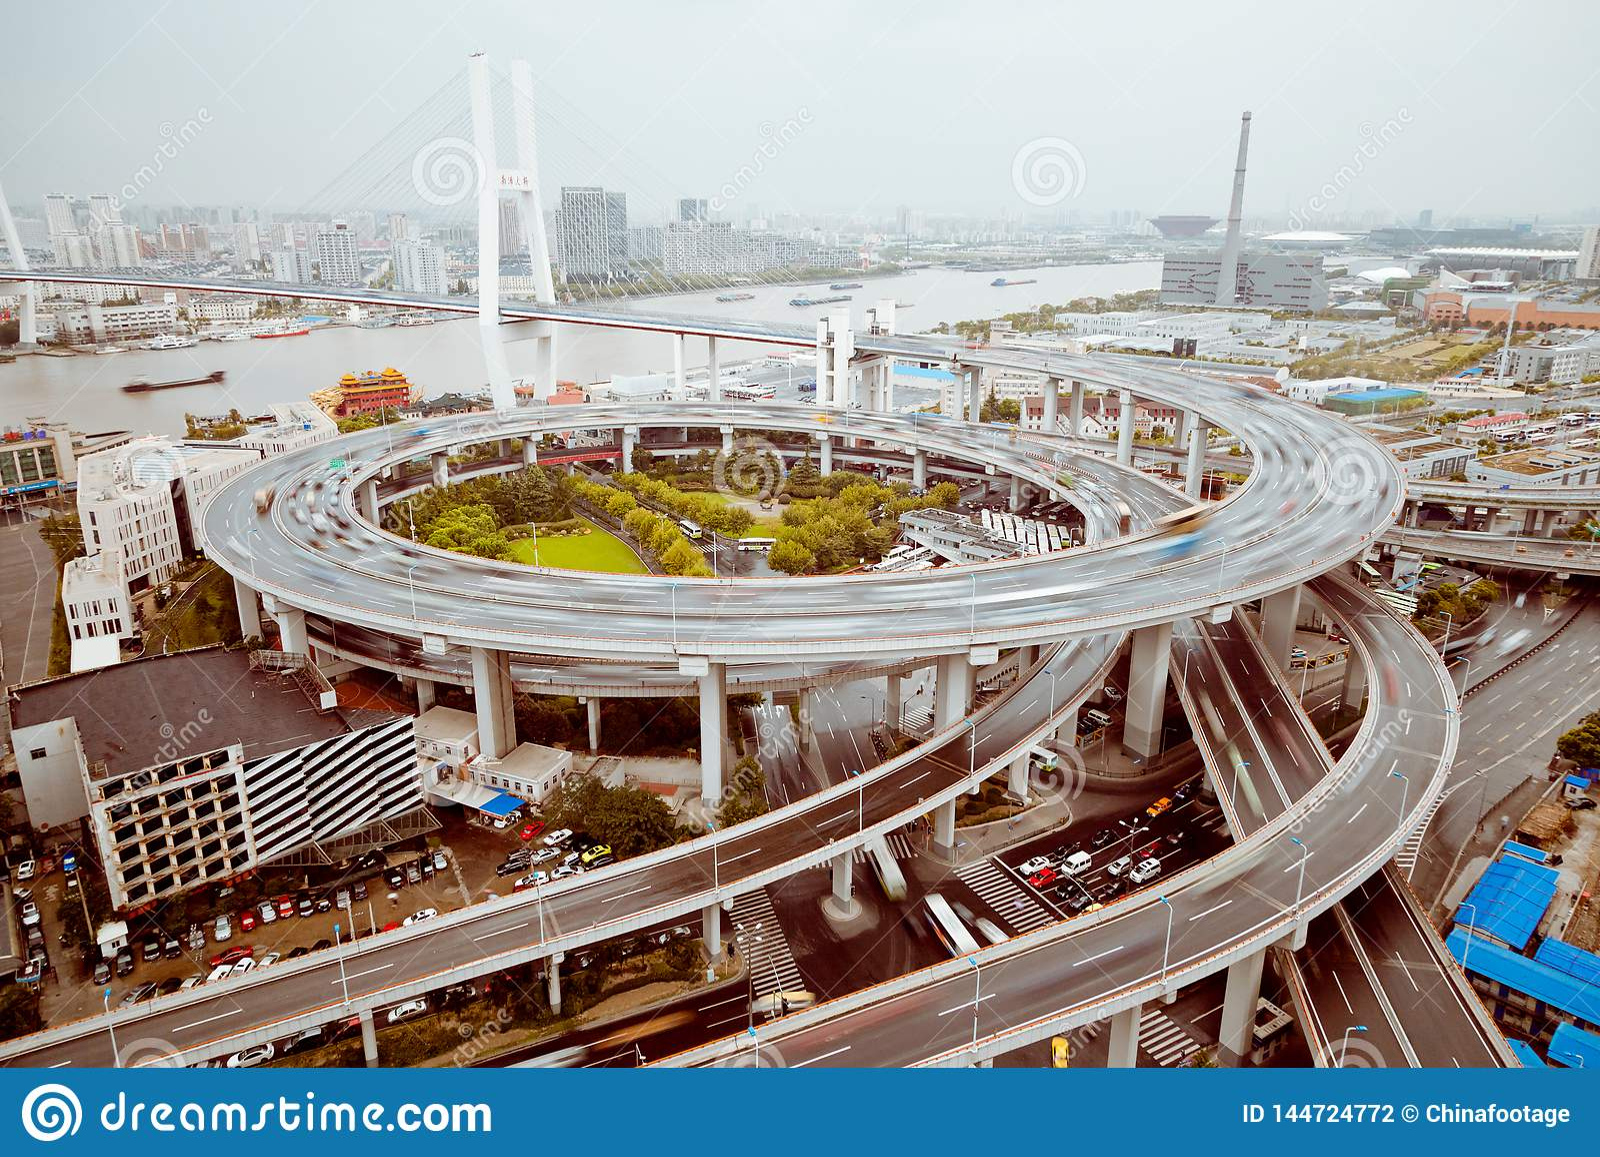 Vista del puente de Shangai Nanpu, Shangai, China vista del puente de Shangai Nanpu, Shangai, China